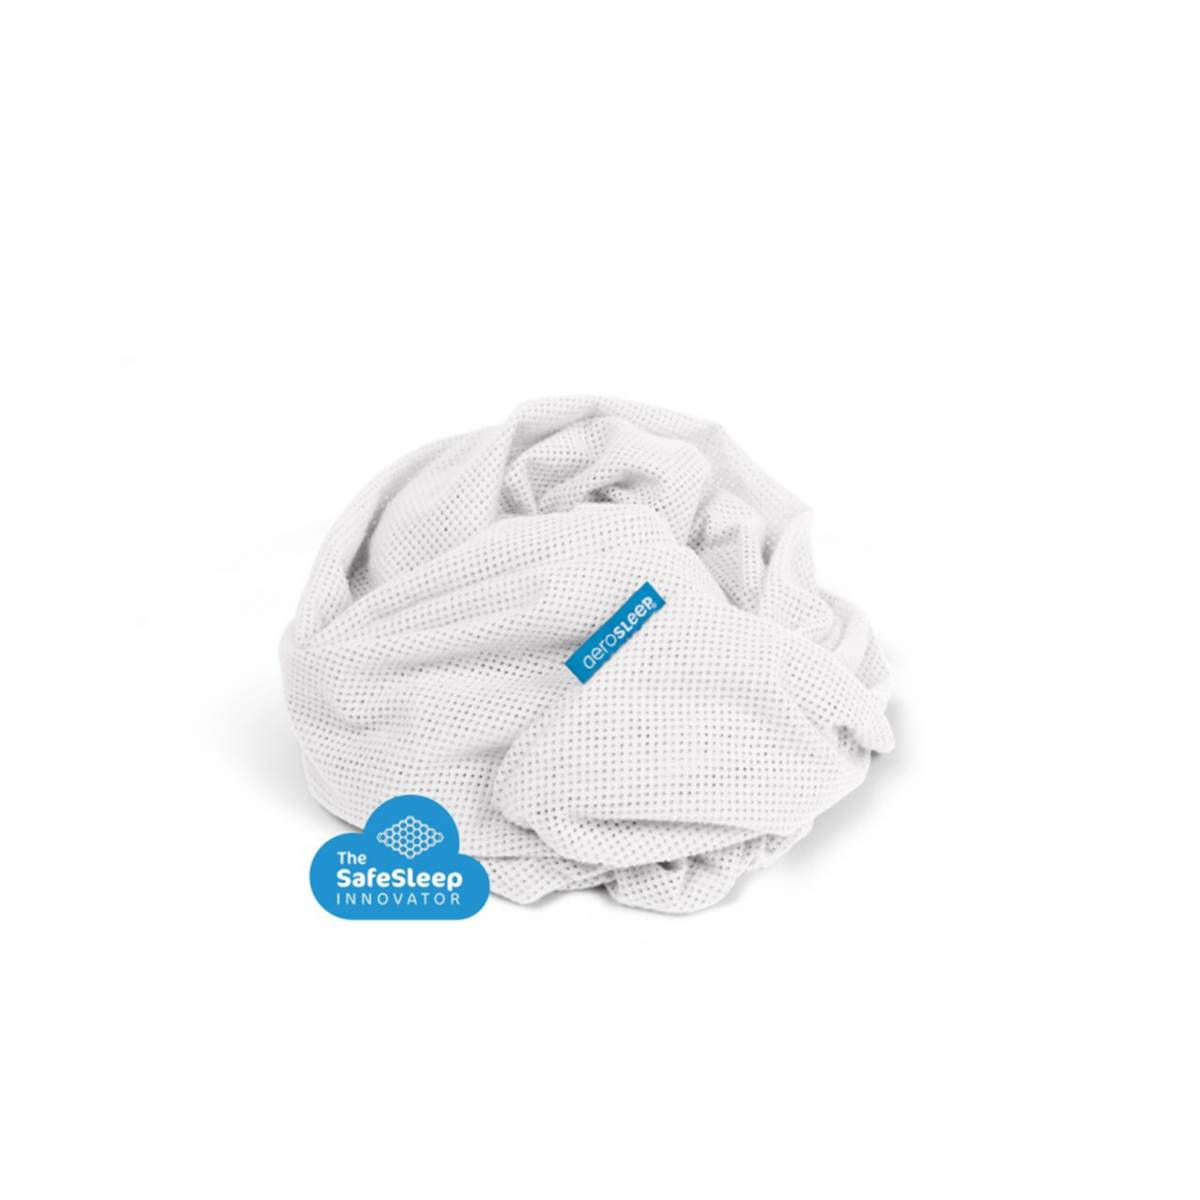 AeroSleep Premium SafeSleep Laken, 70x140cm Hvit